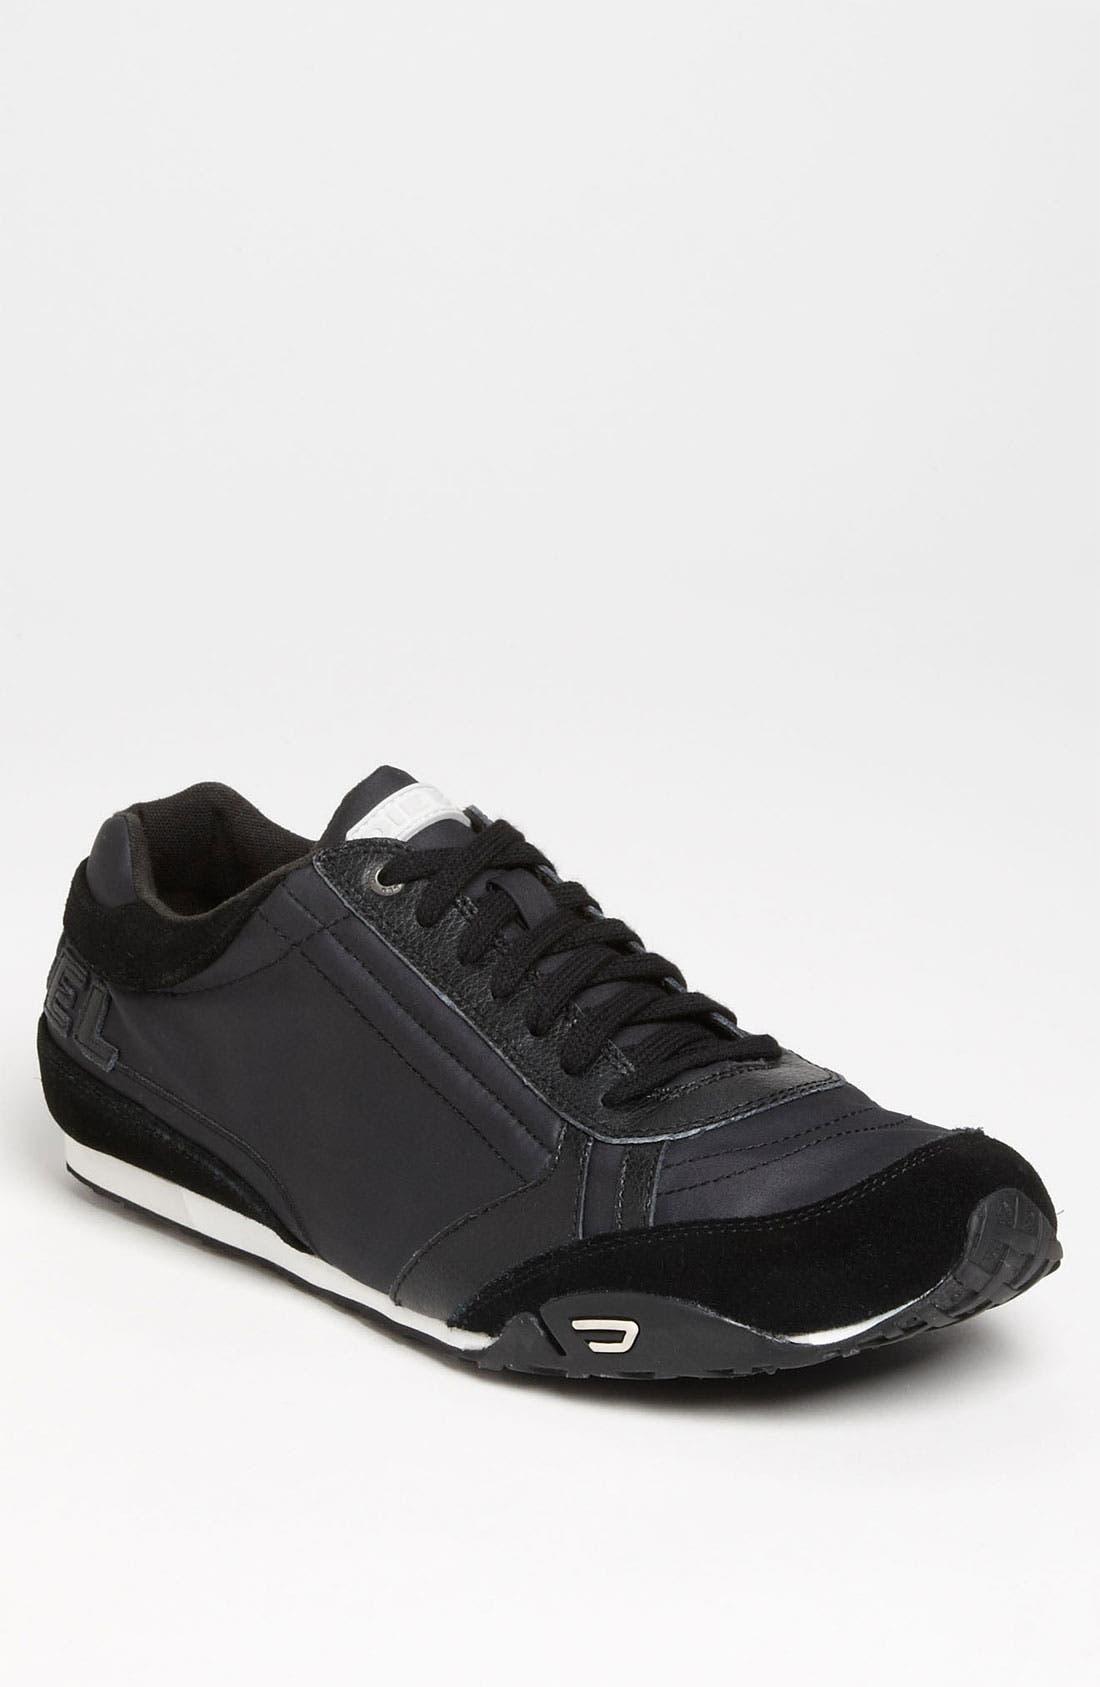 Main Image - DIESEL® 'Take' Leather Sneaker